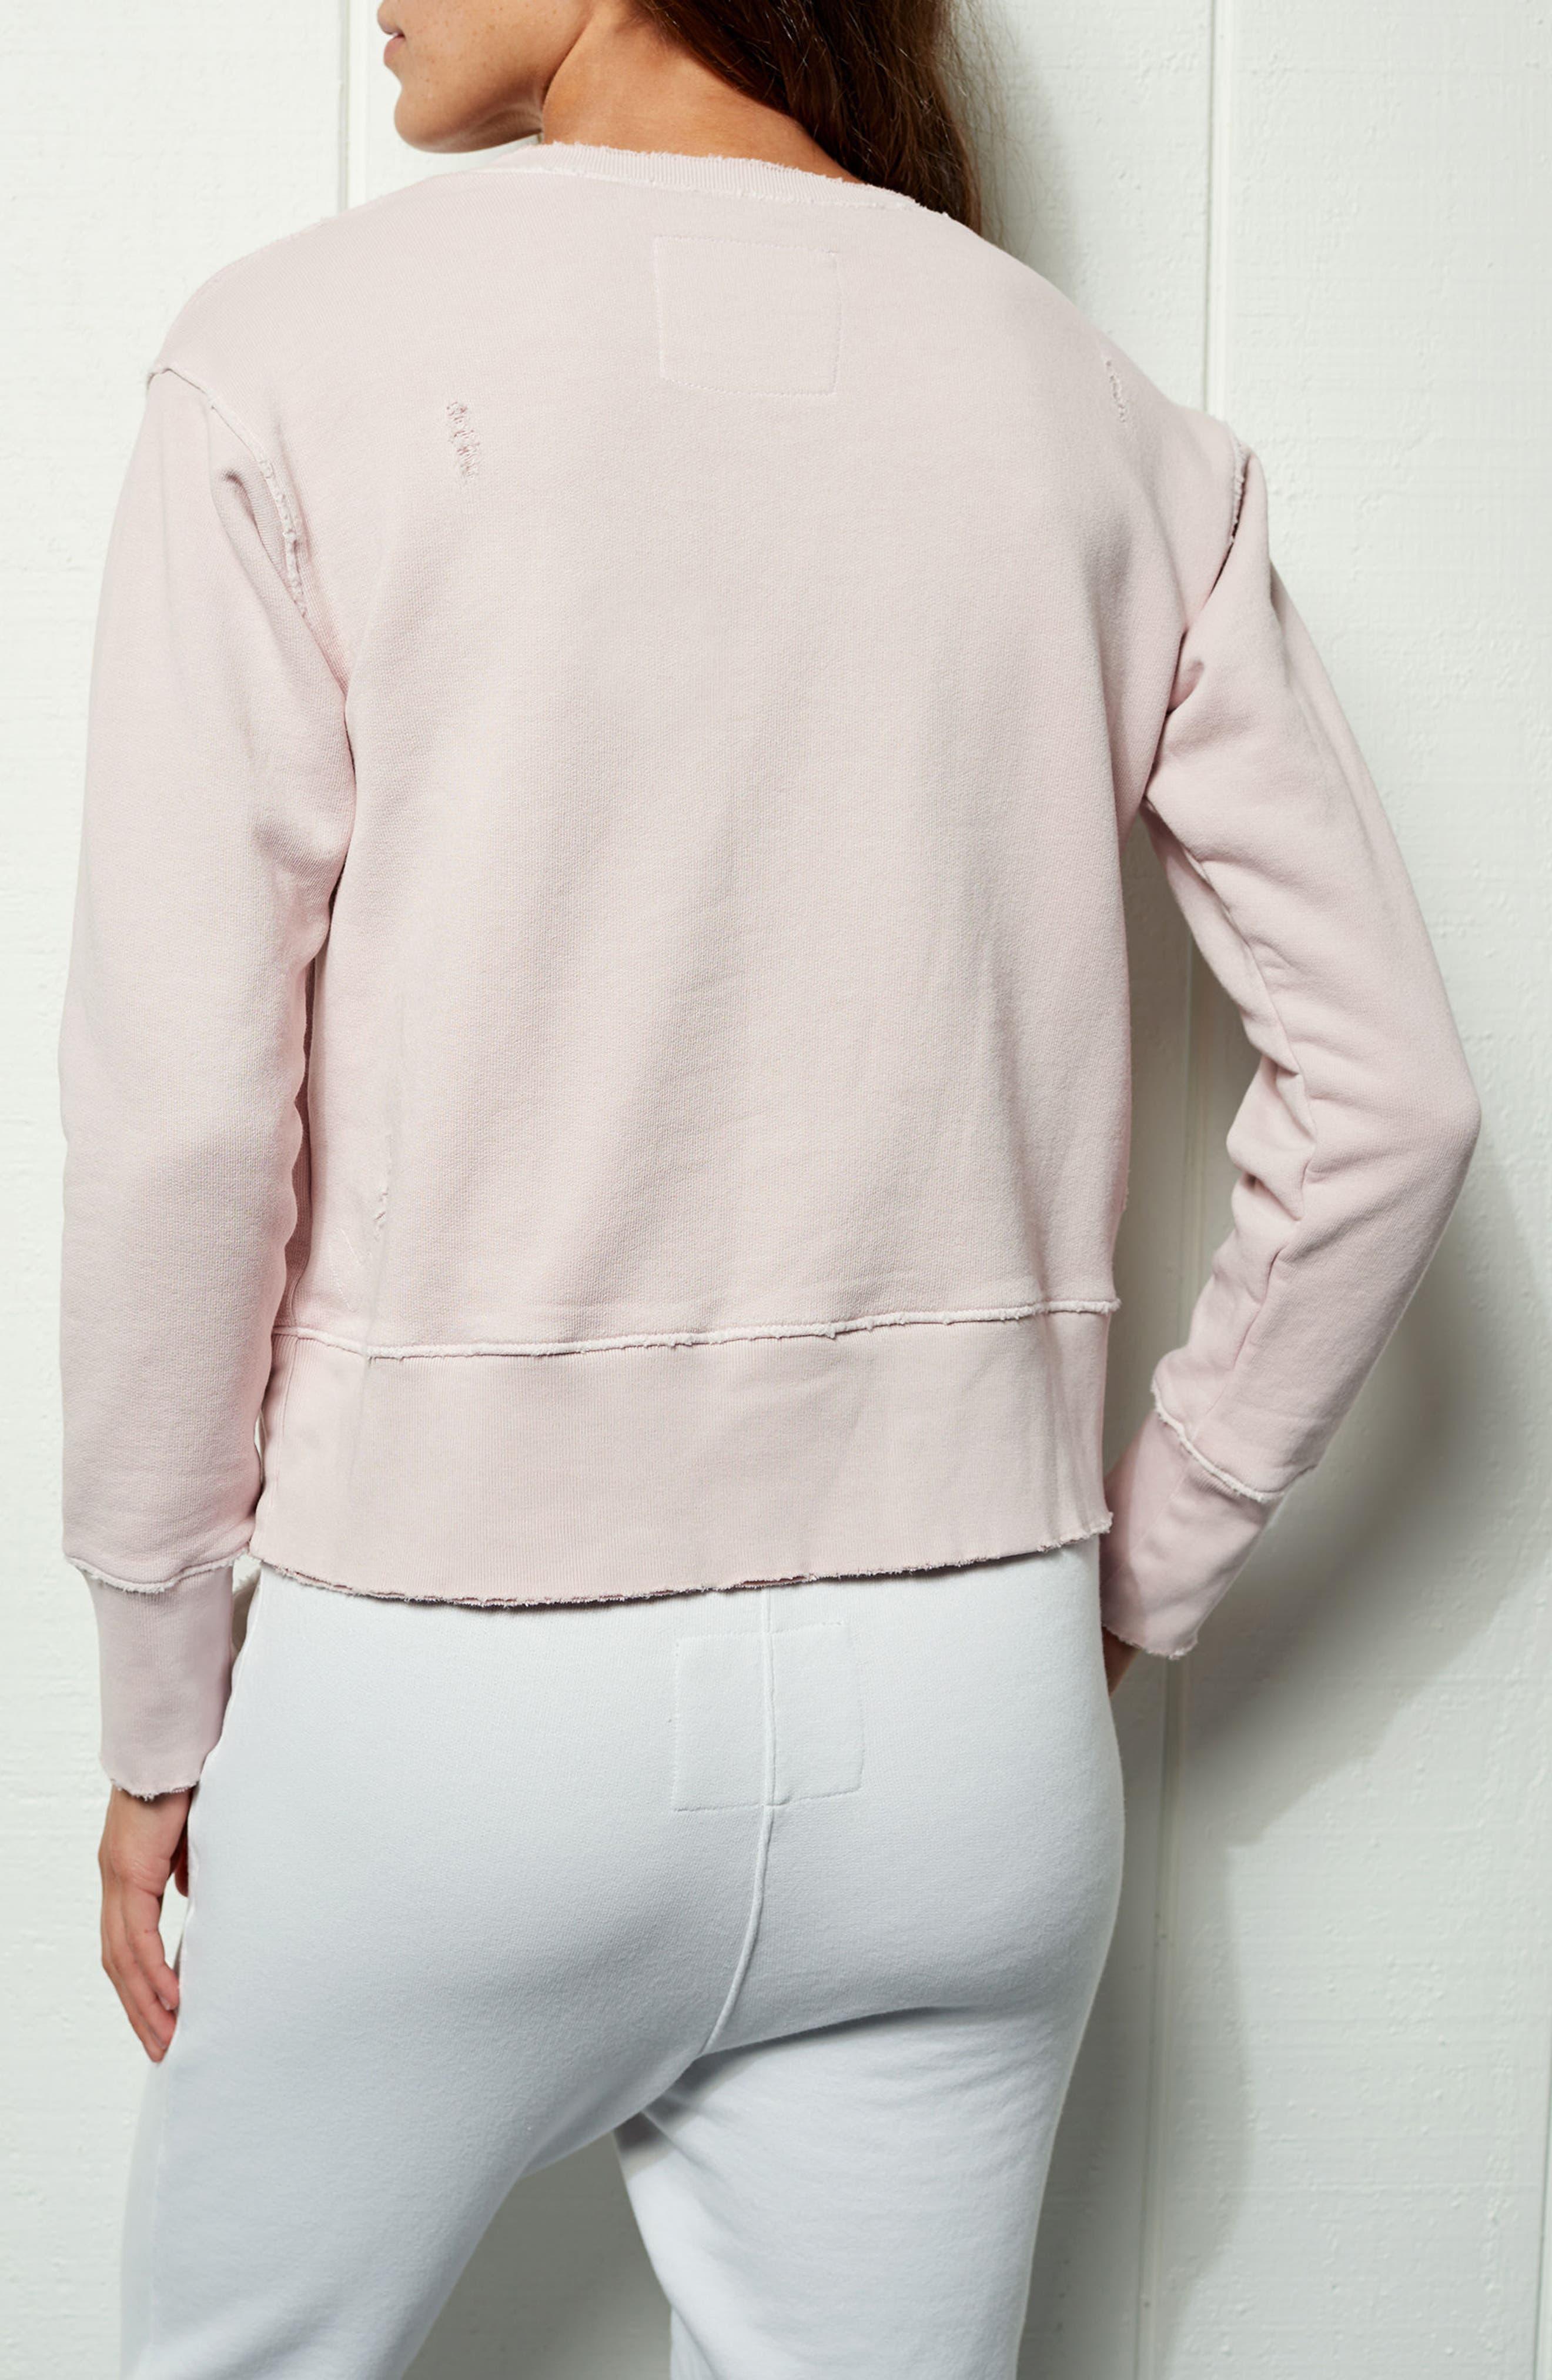 Tee Lab Cotton Sweatshirt,                             Alternate thumbnail 7, color,